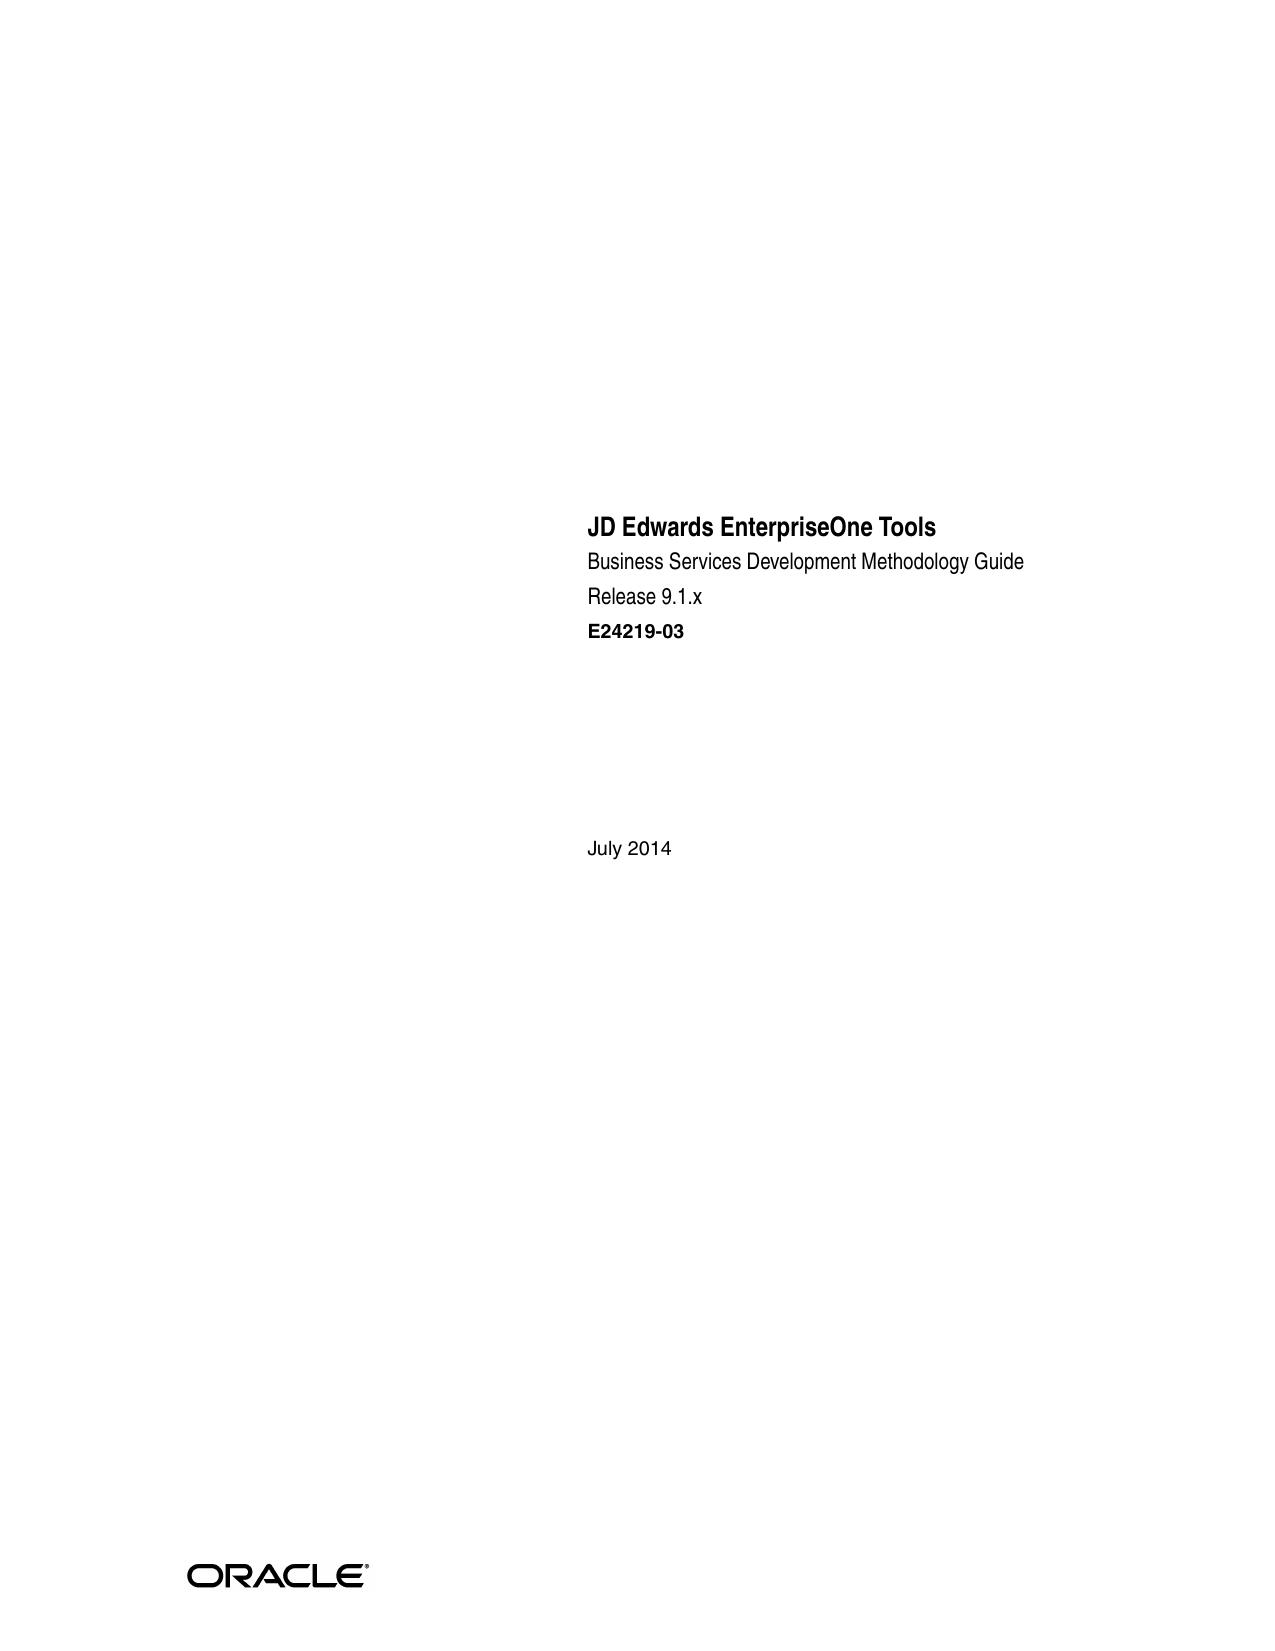 JD Edwards EnterpriseOne Tools Business Services Development